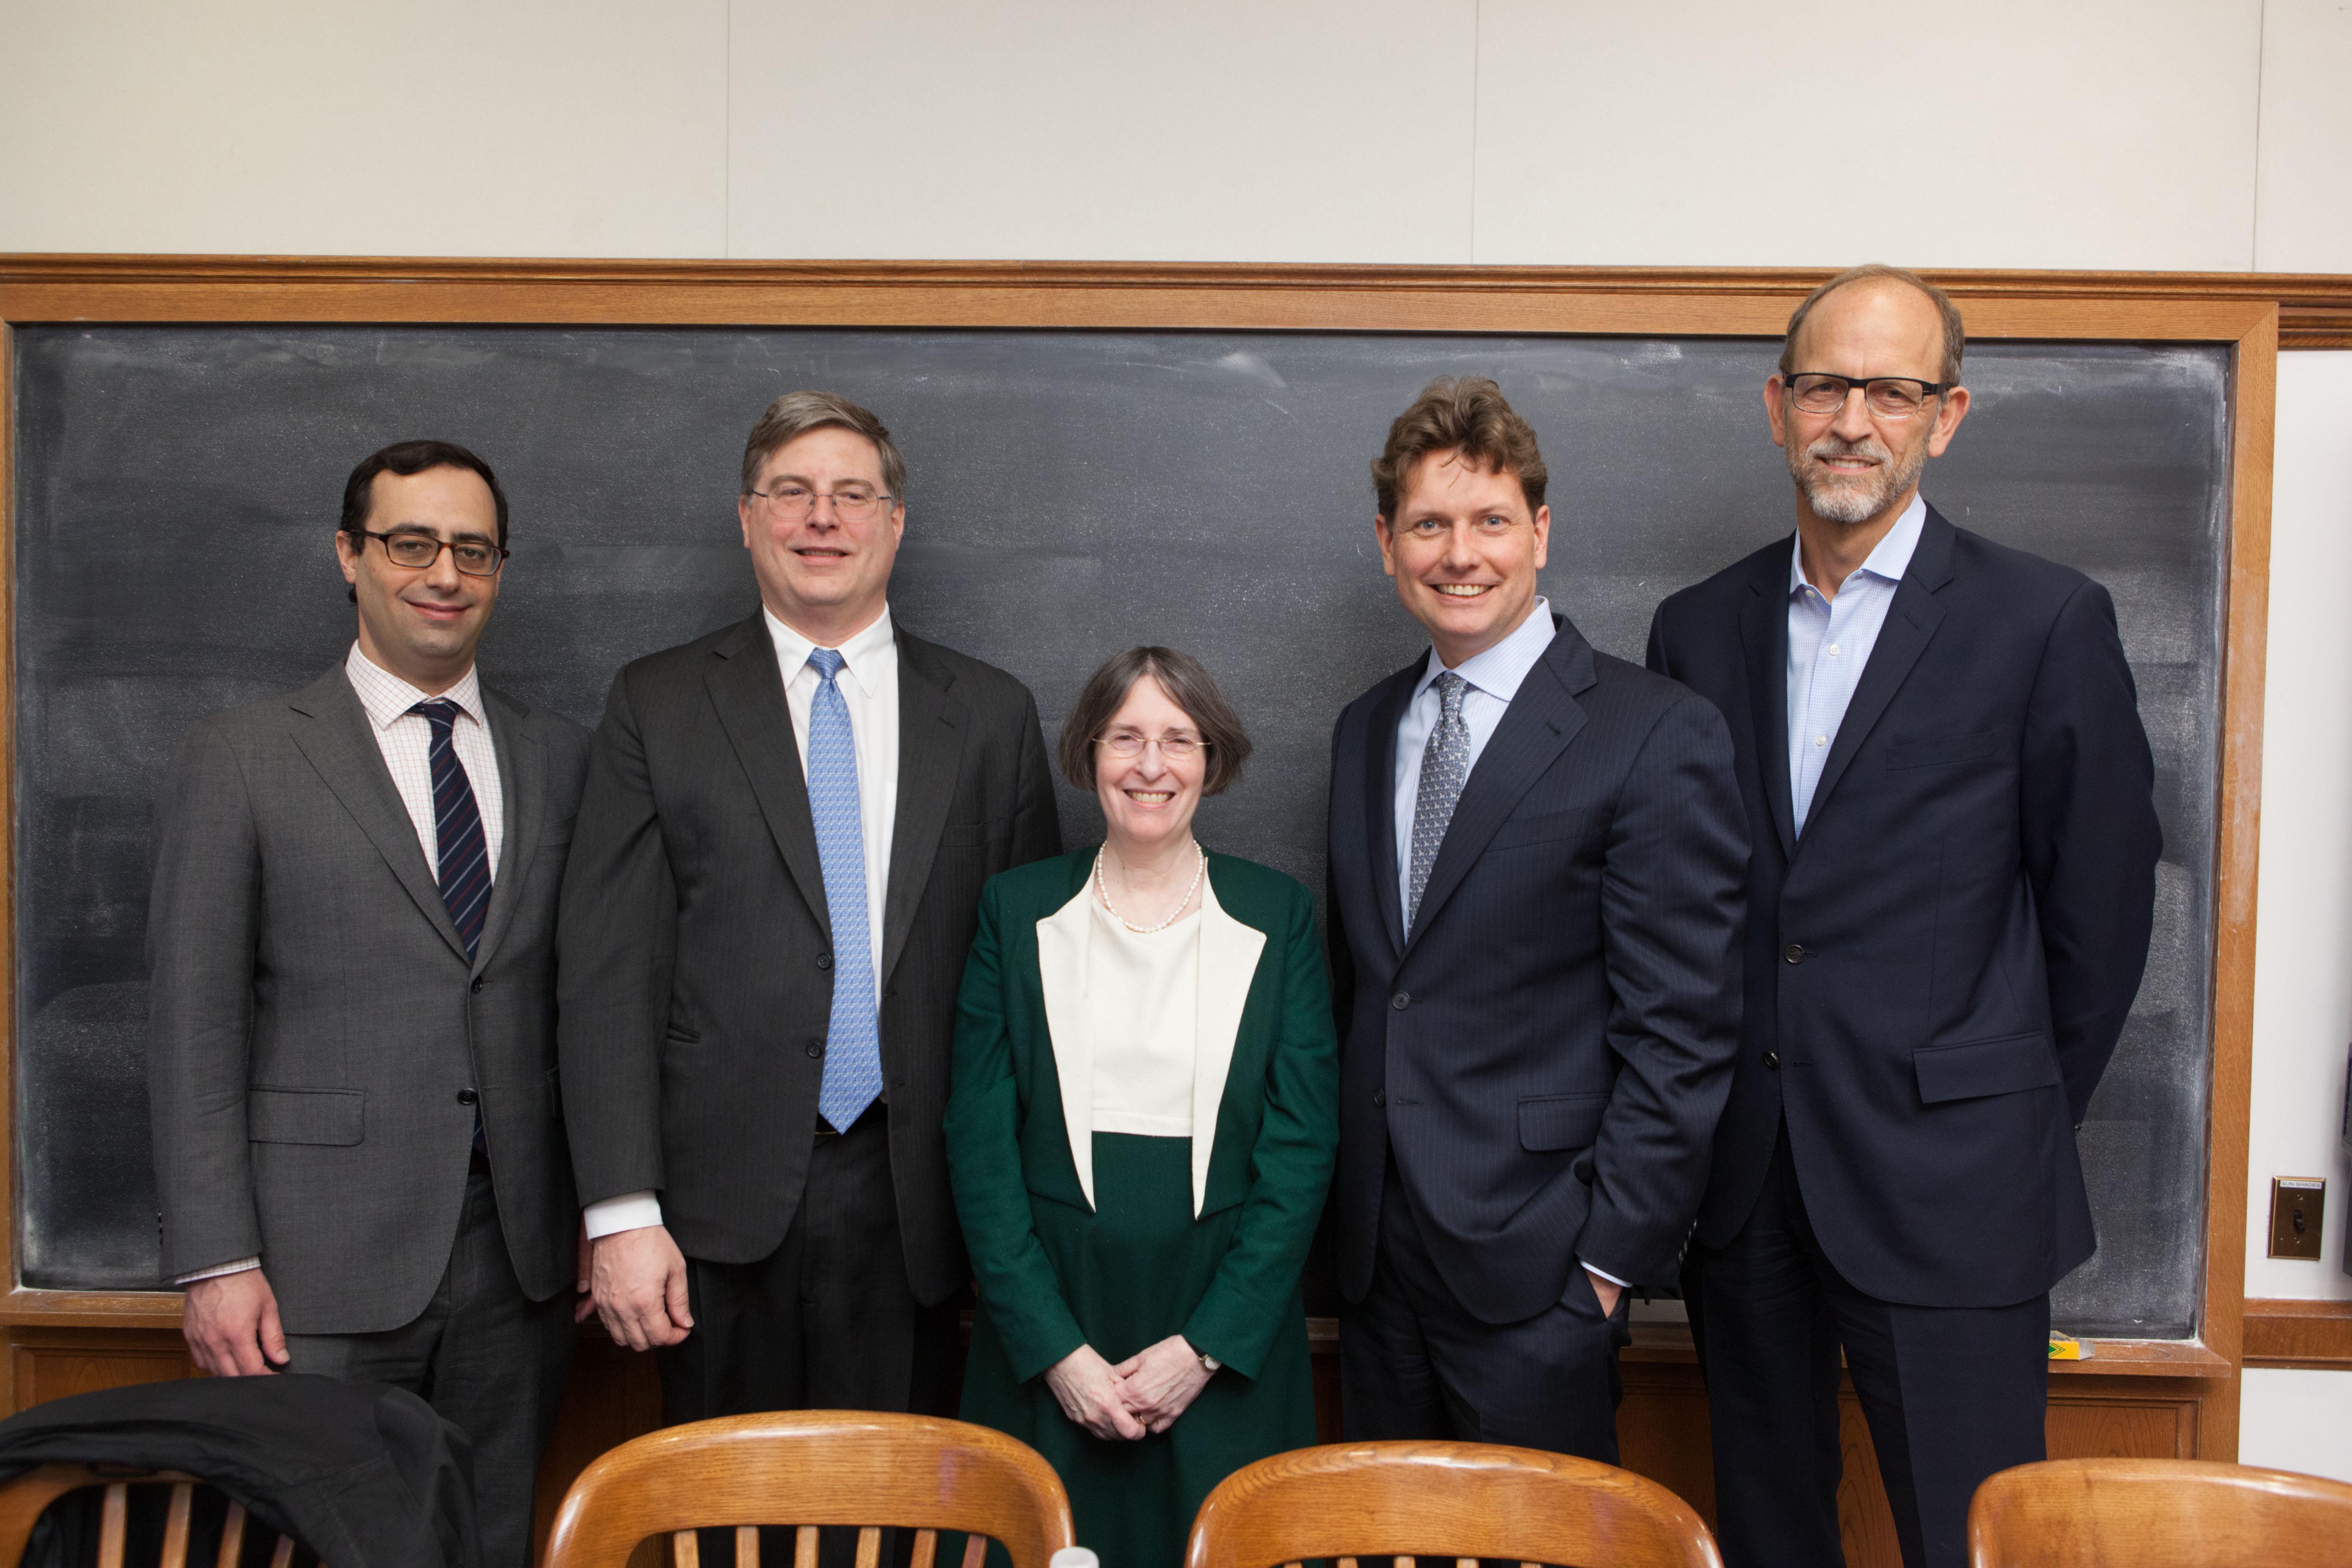 Matt Levine '04, Robert Cook, YLS Prof. and Center Dir. Roberta Romano '80, Columbia Business Prof. Charles Jones, and Edward Nicoll '97